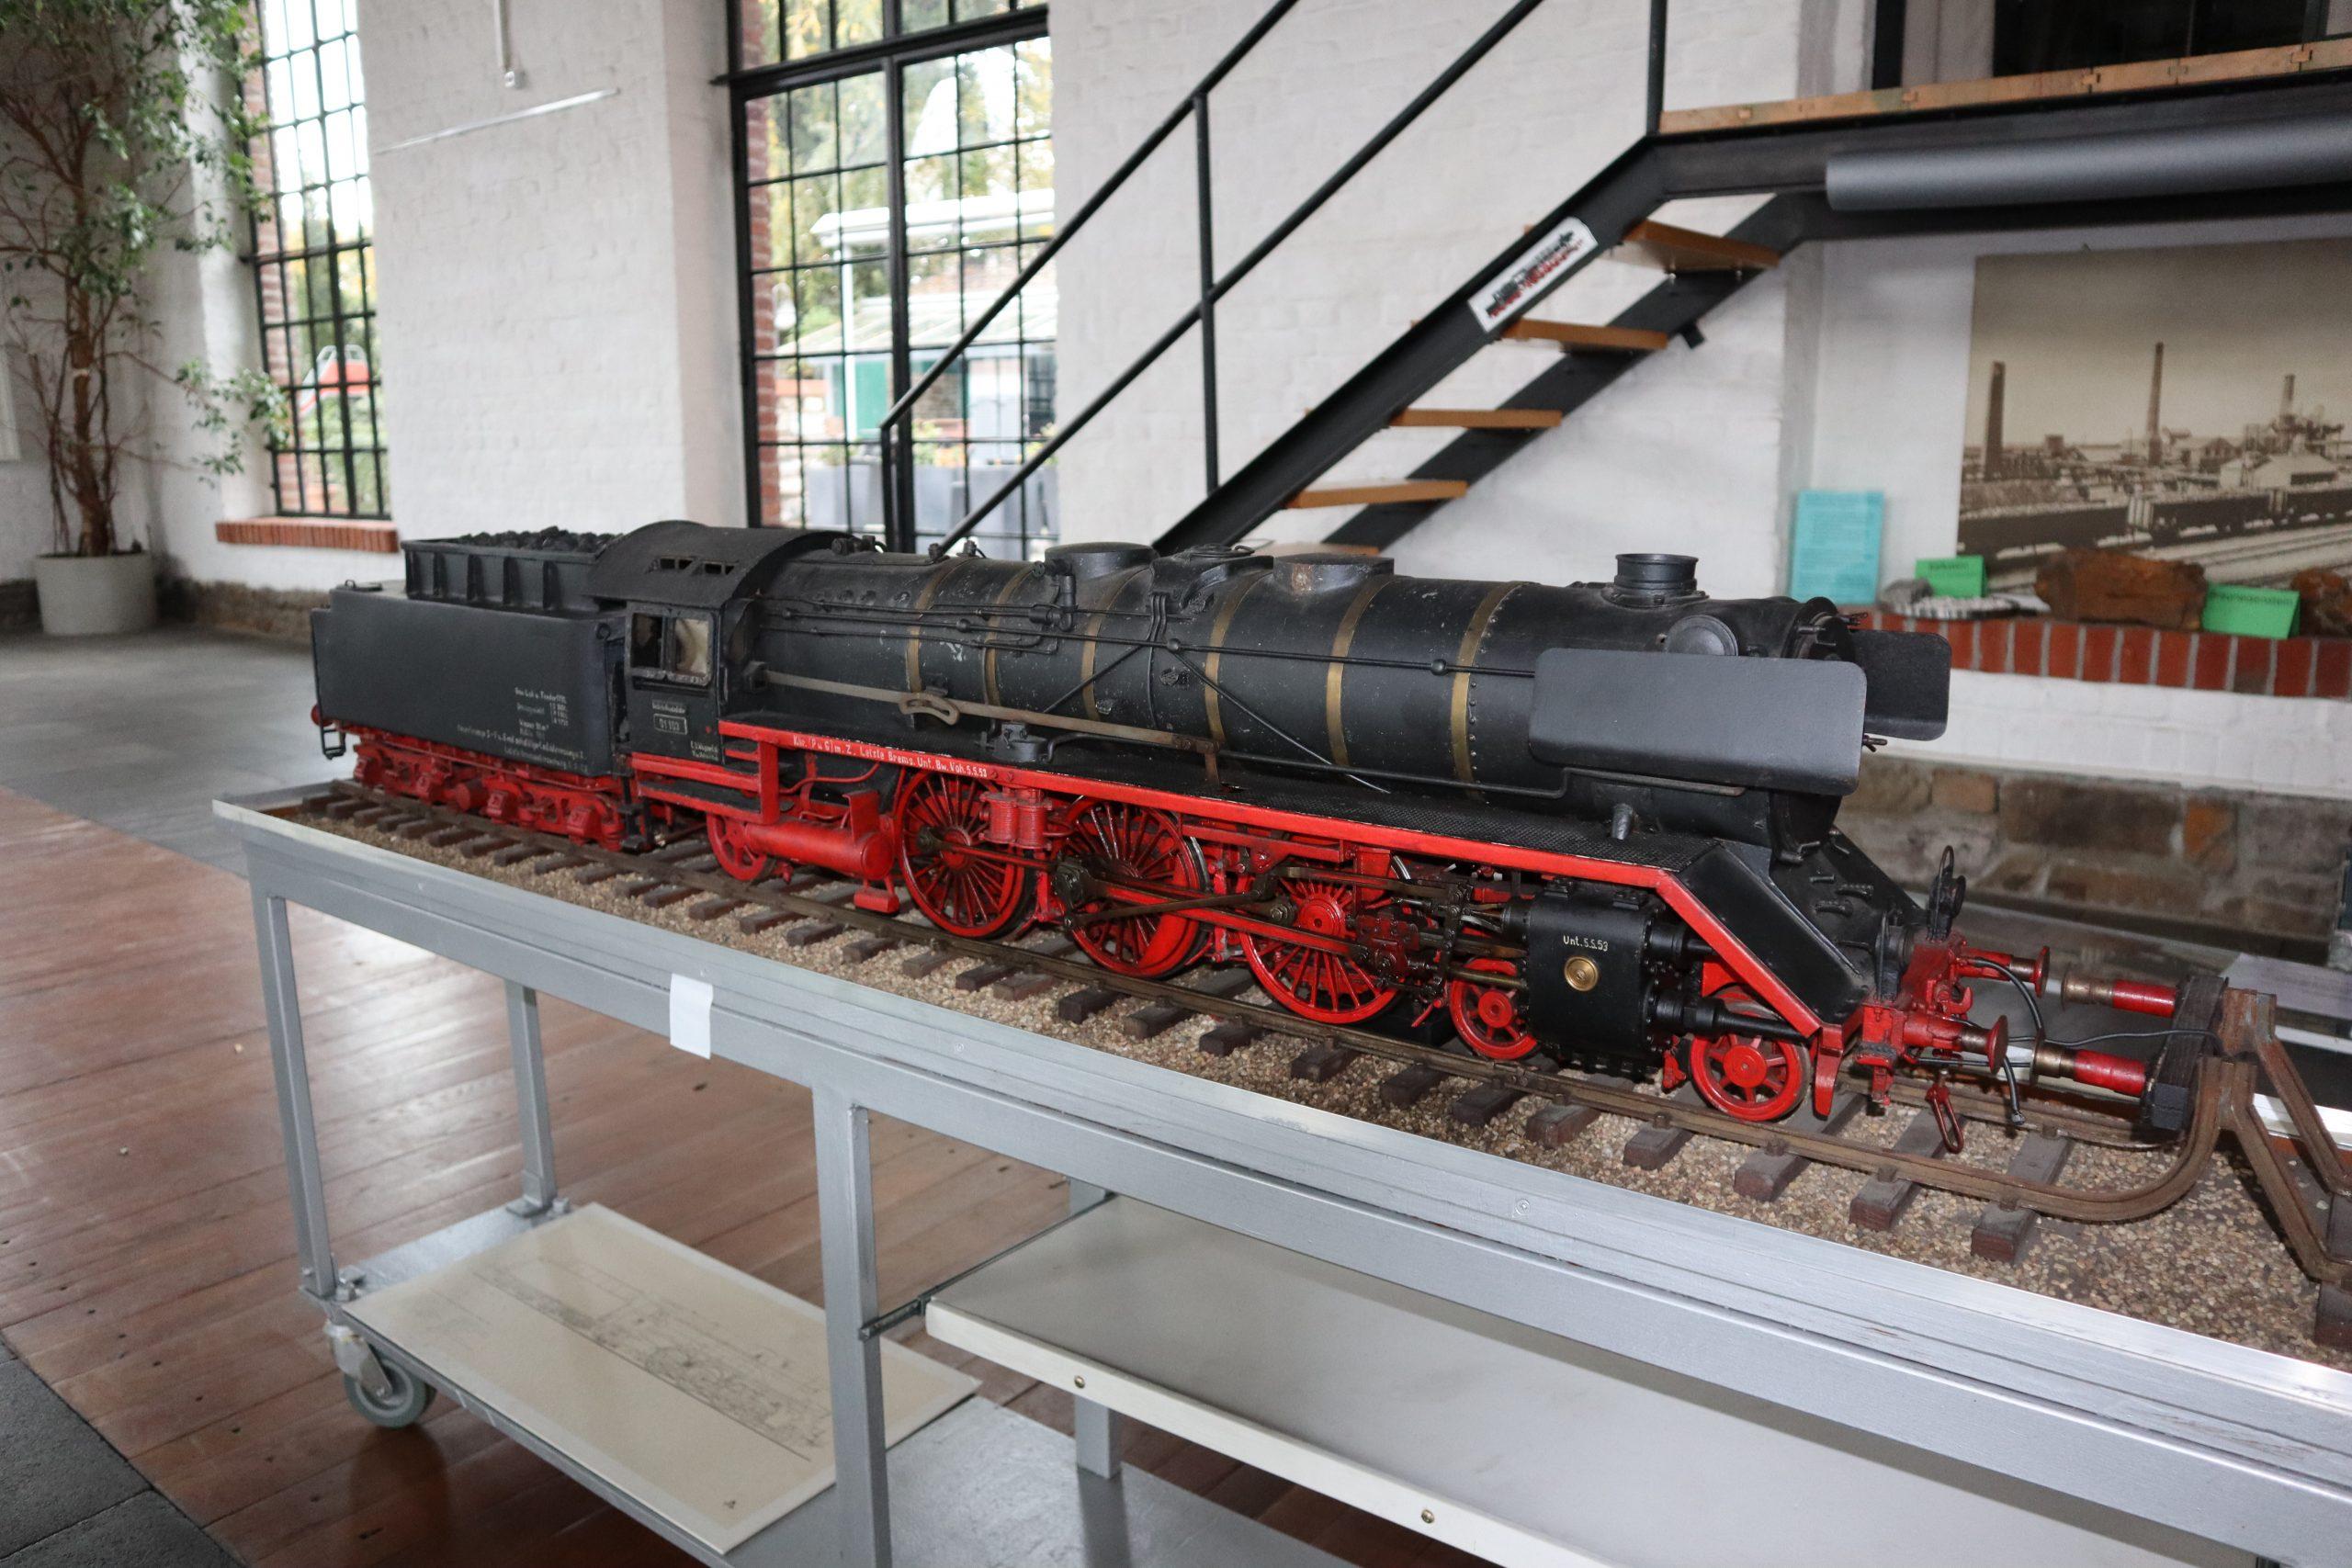 Dampflokmodell. Foto: Ralf Fellenberg, Eisenbahn- und Heimatmuseum Erkrath-Hochdahl e.V.